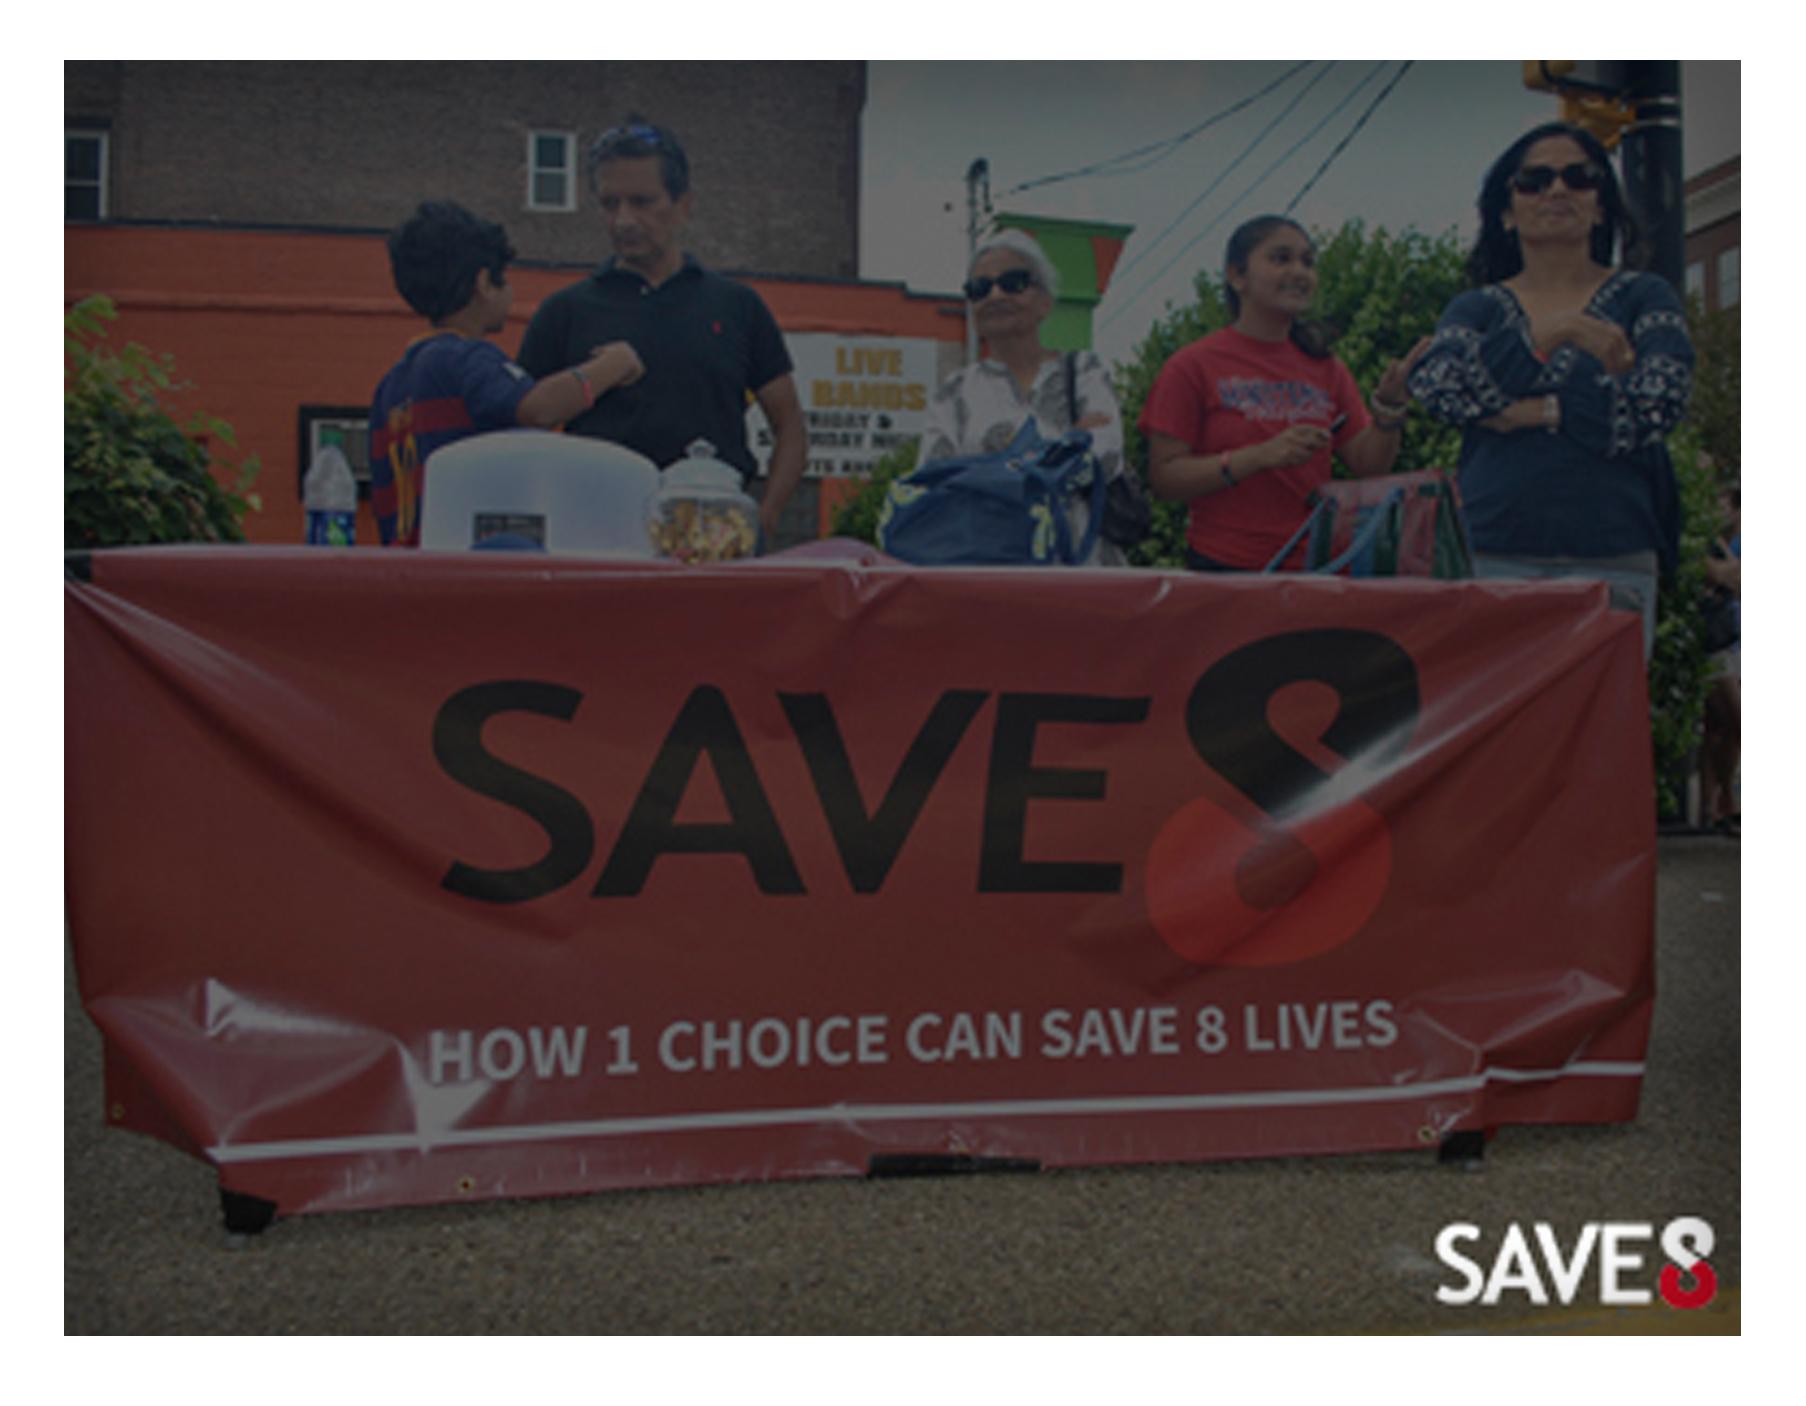 Save8 Fundraiser